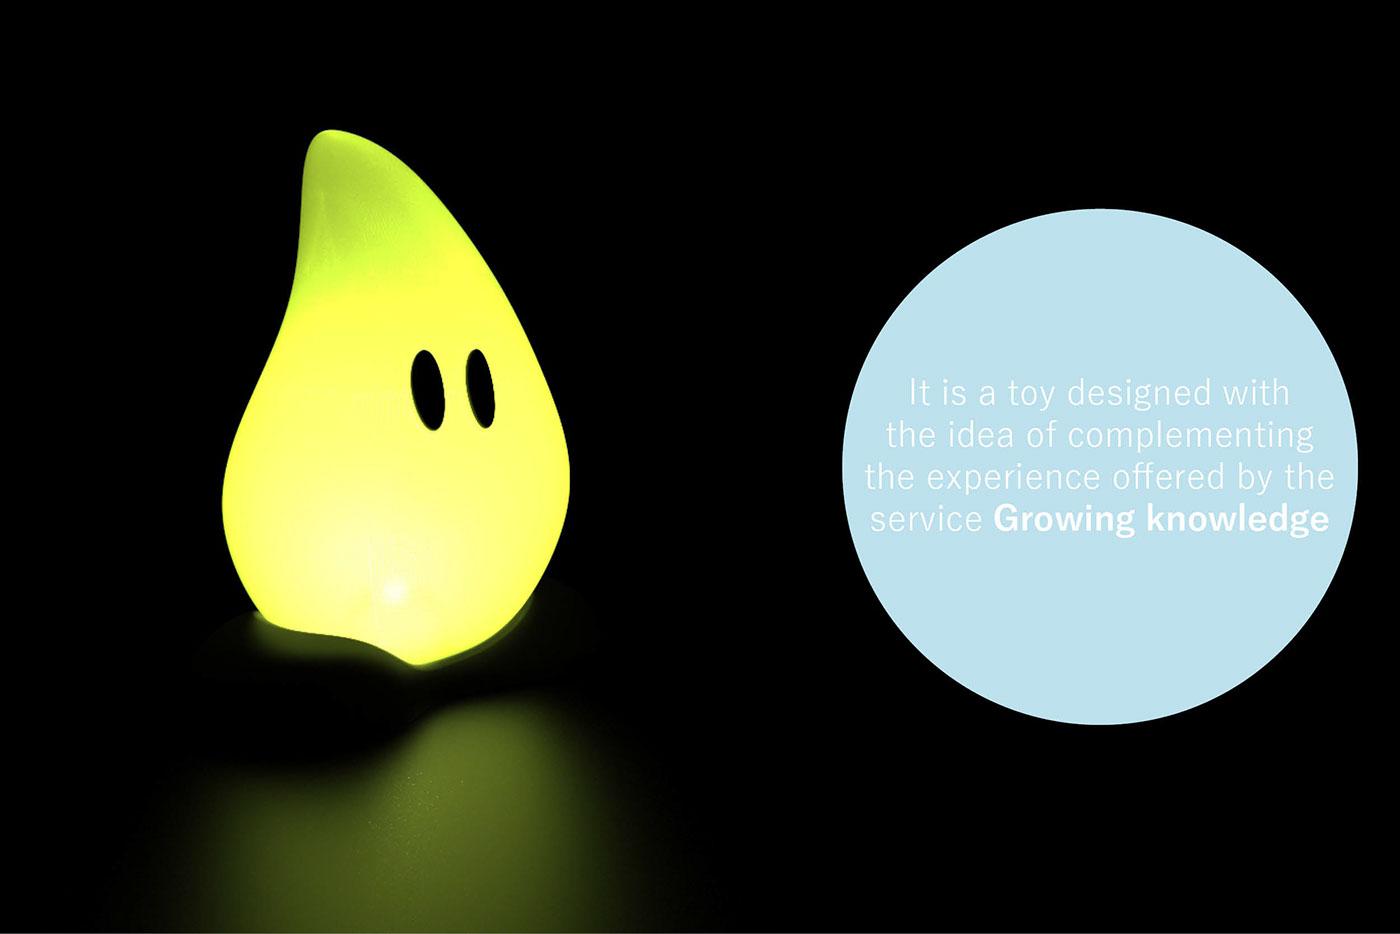 toy kids children internetofthings diabetes healthcare design for